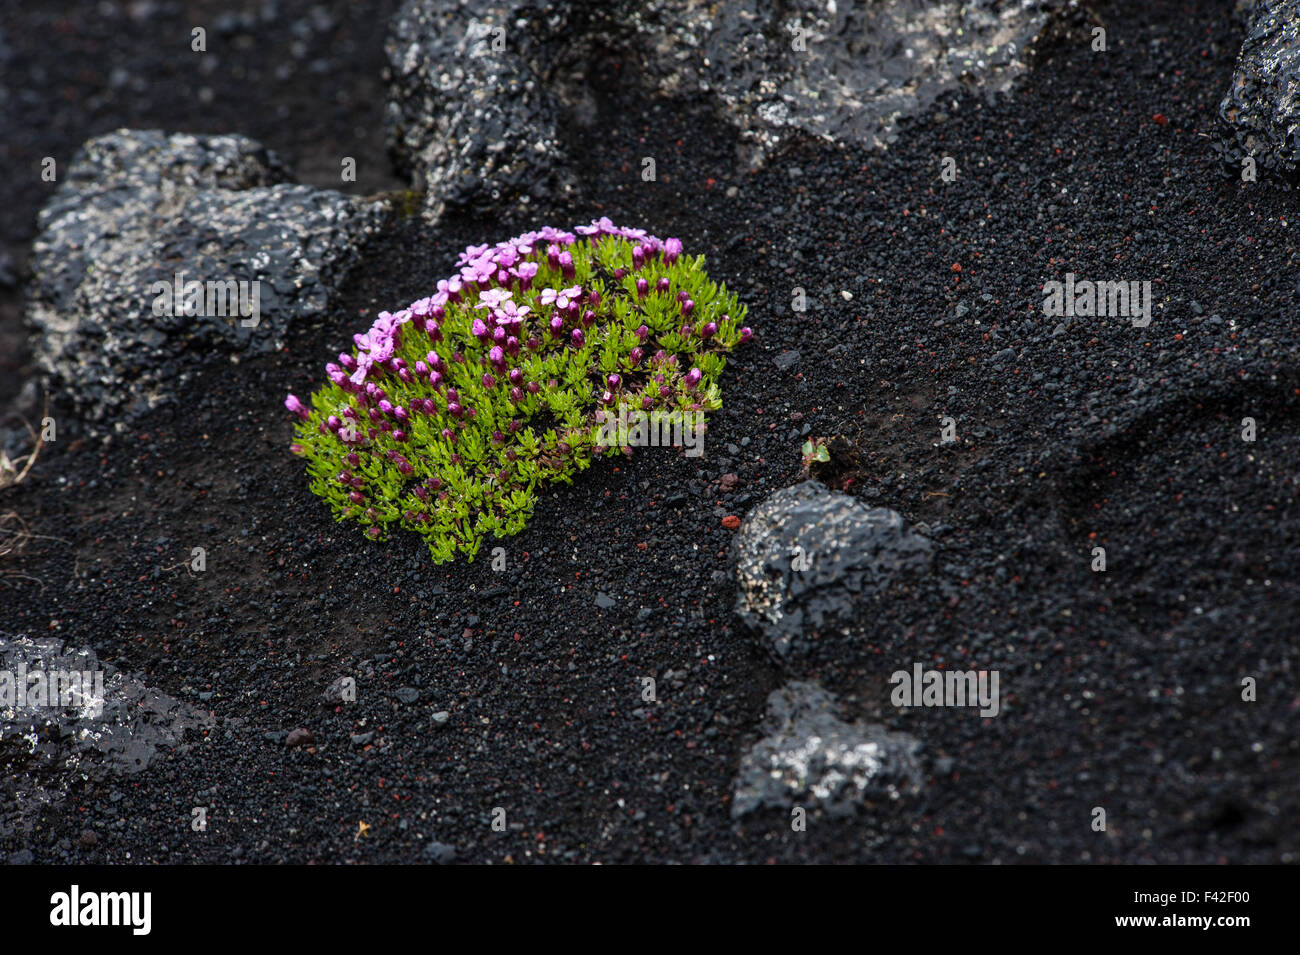 Flower in lava field, Iceland - Stock Image